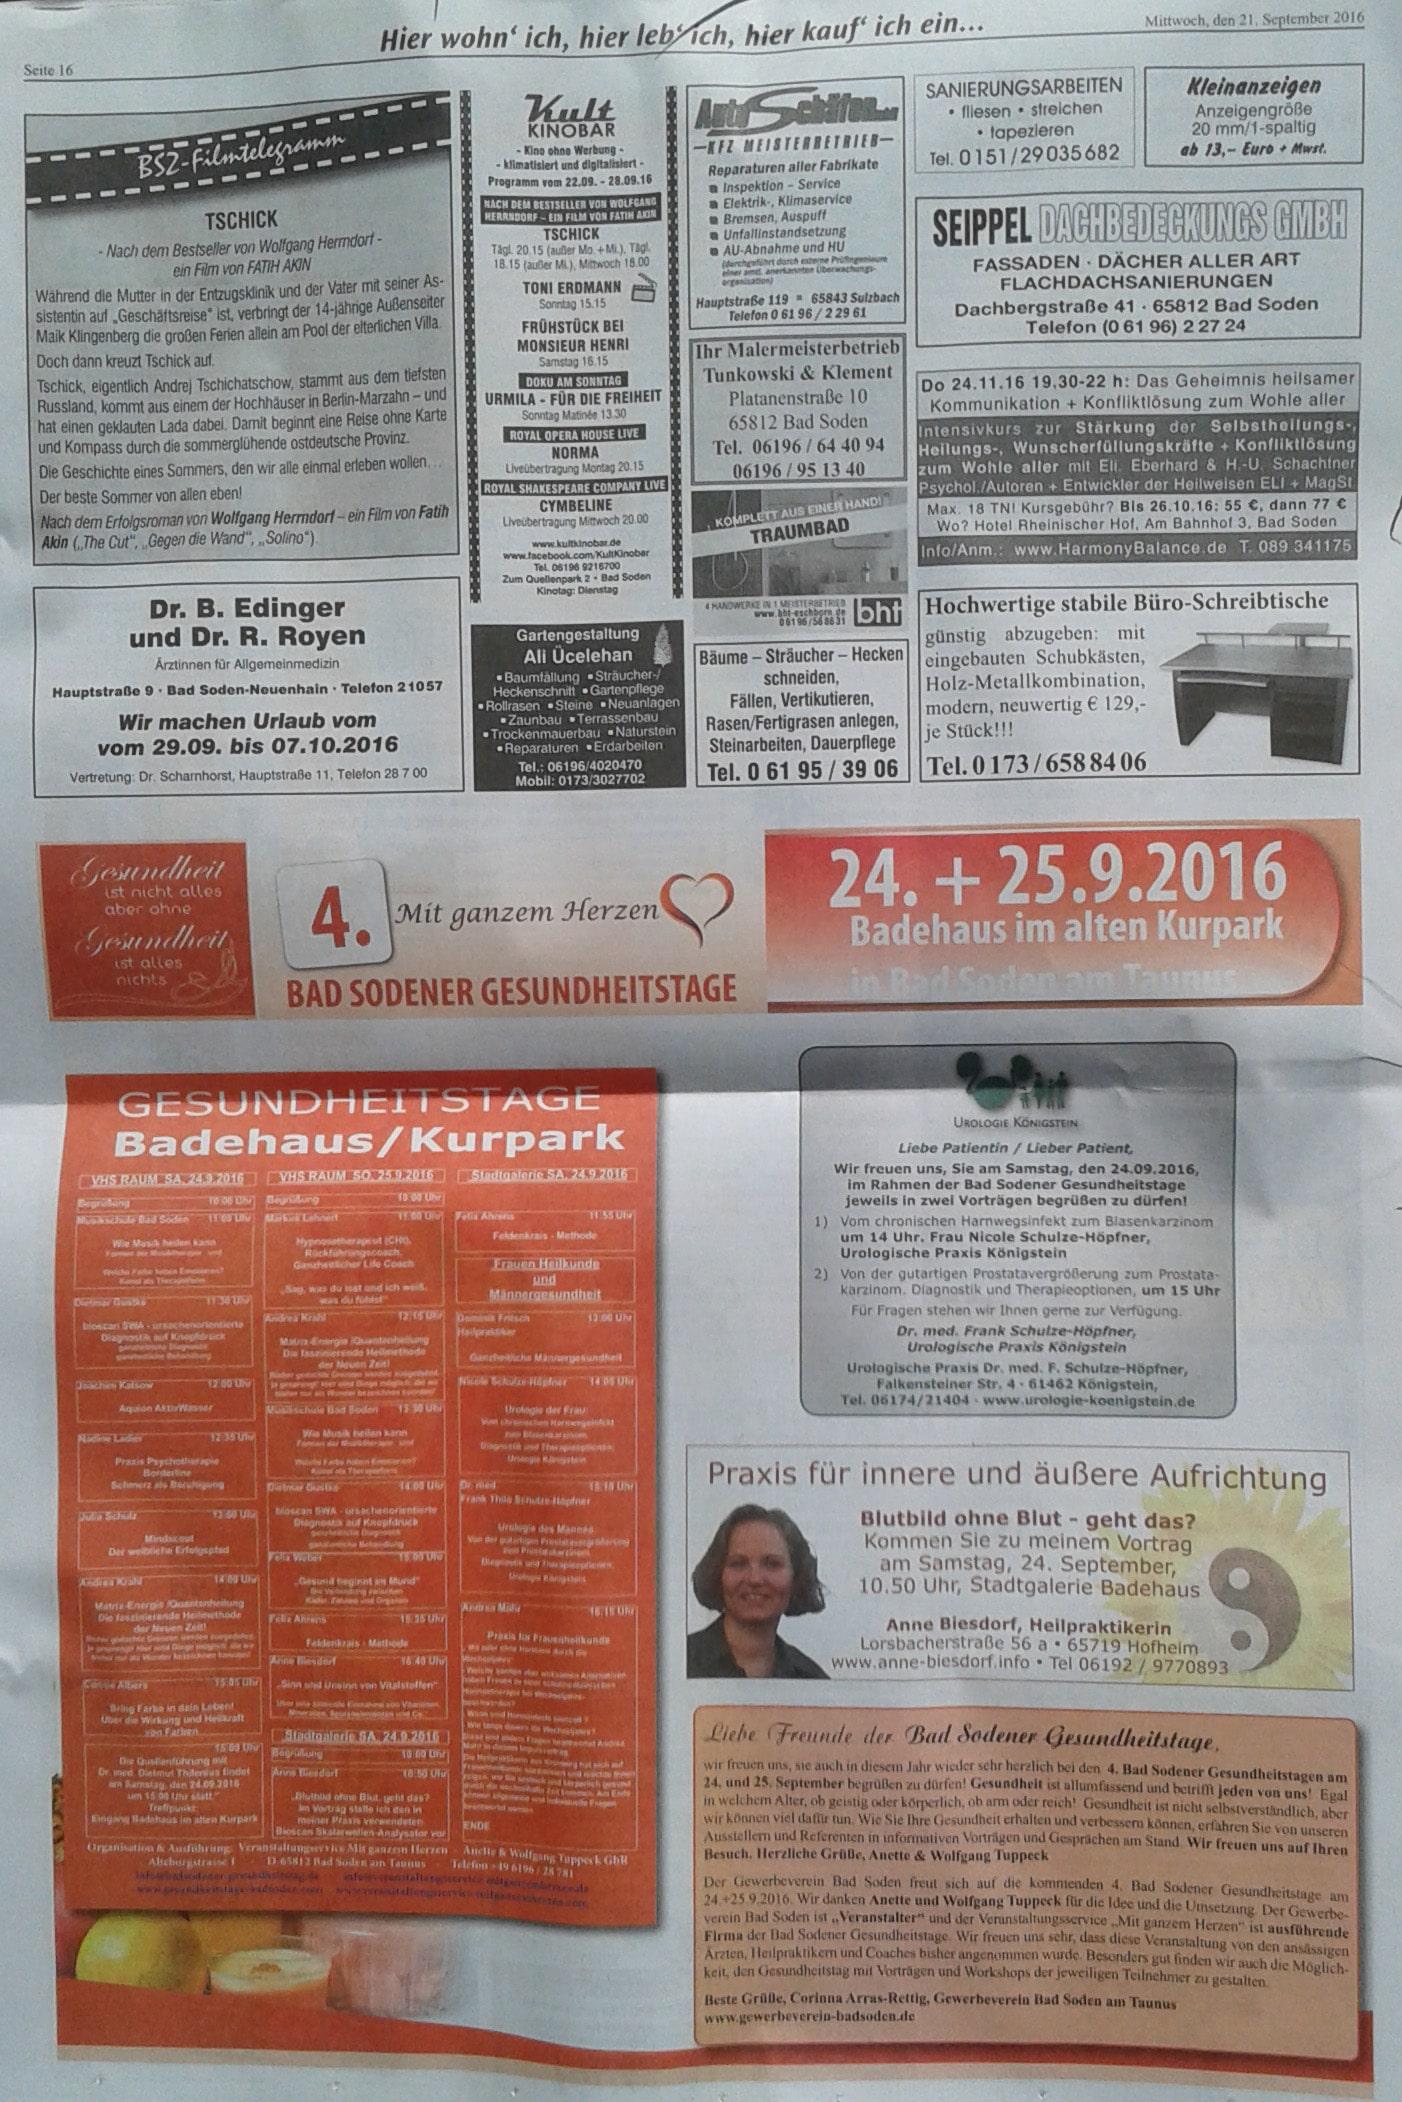 presse_21-9-2016_rueckseite